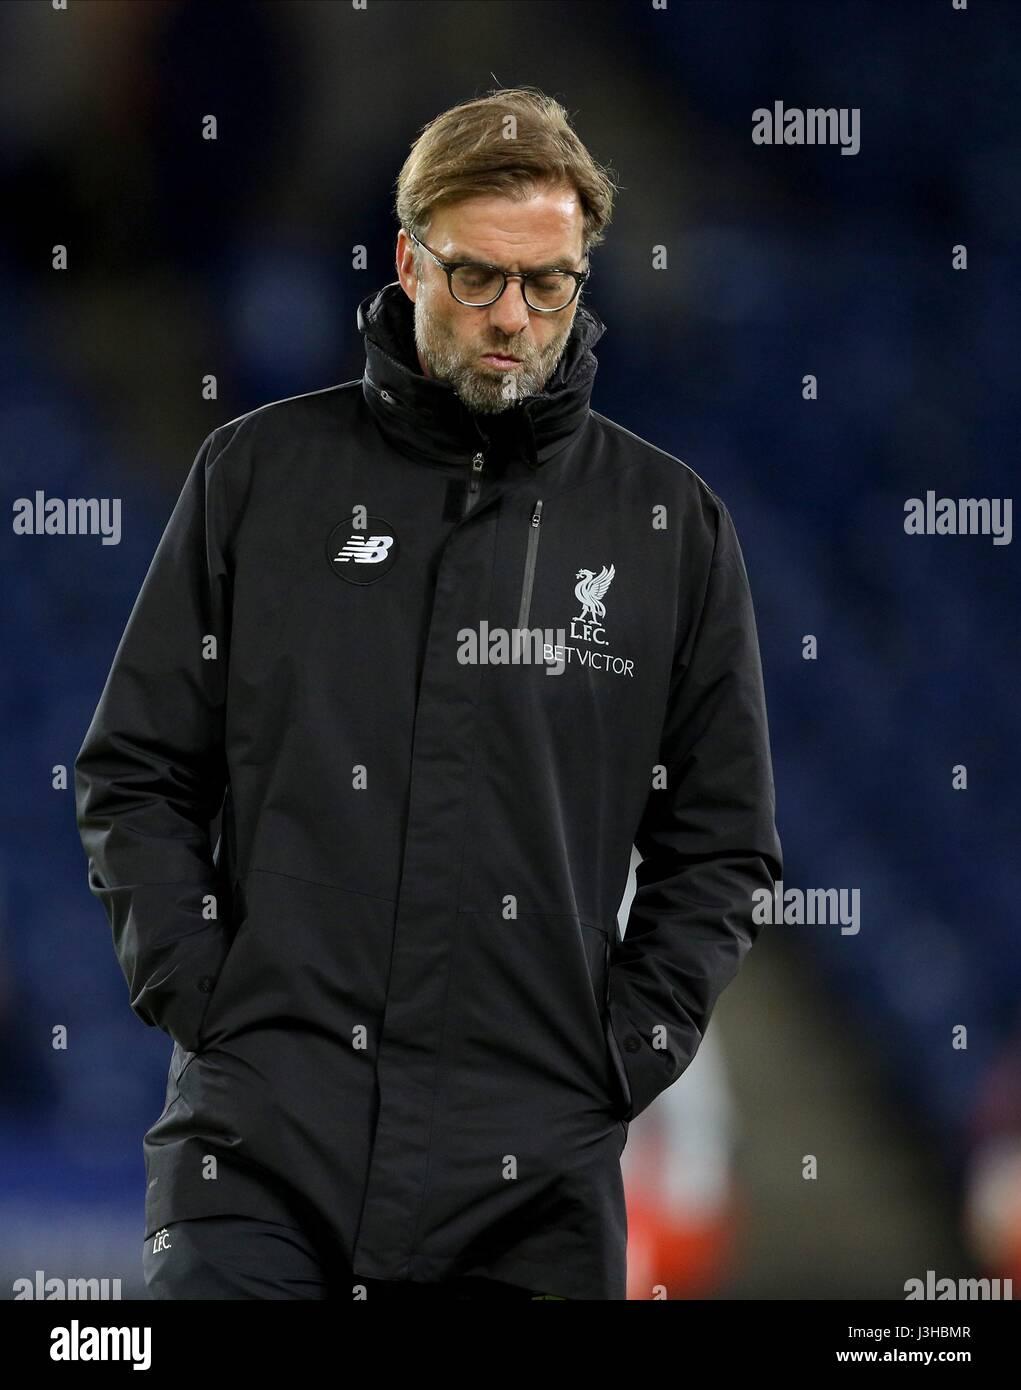 Jurgen Klopp Liverpool Manager King Power Stadium Leicester England Stock Photo Alamy